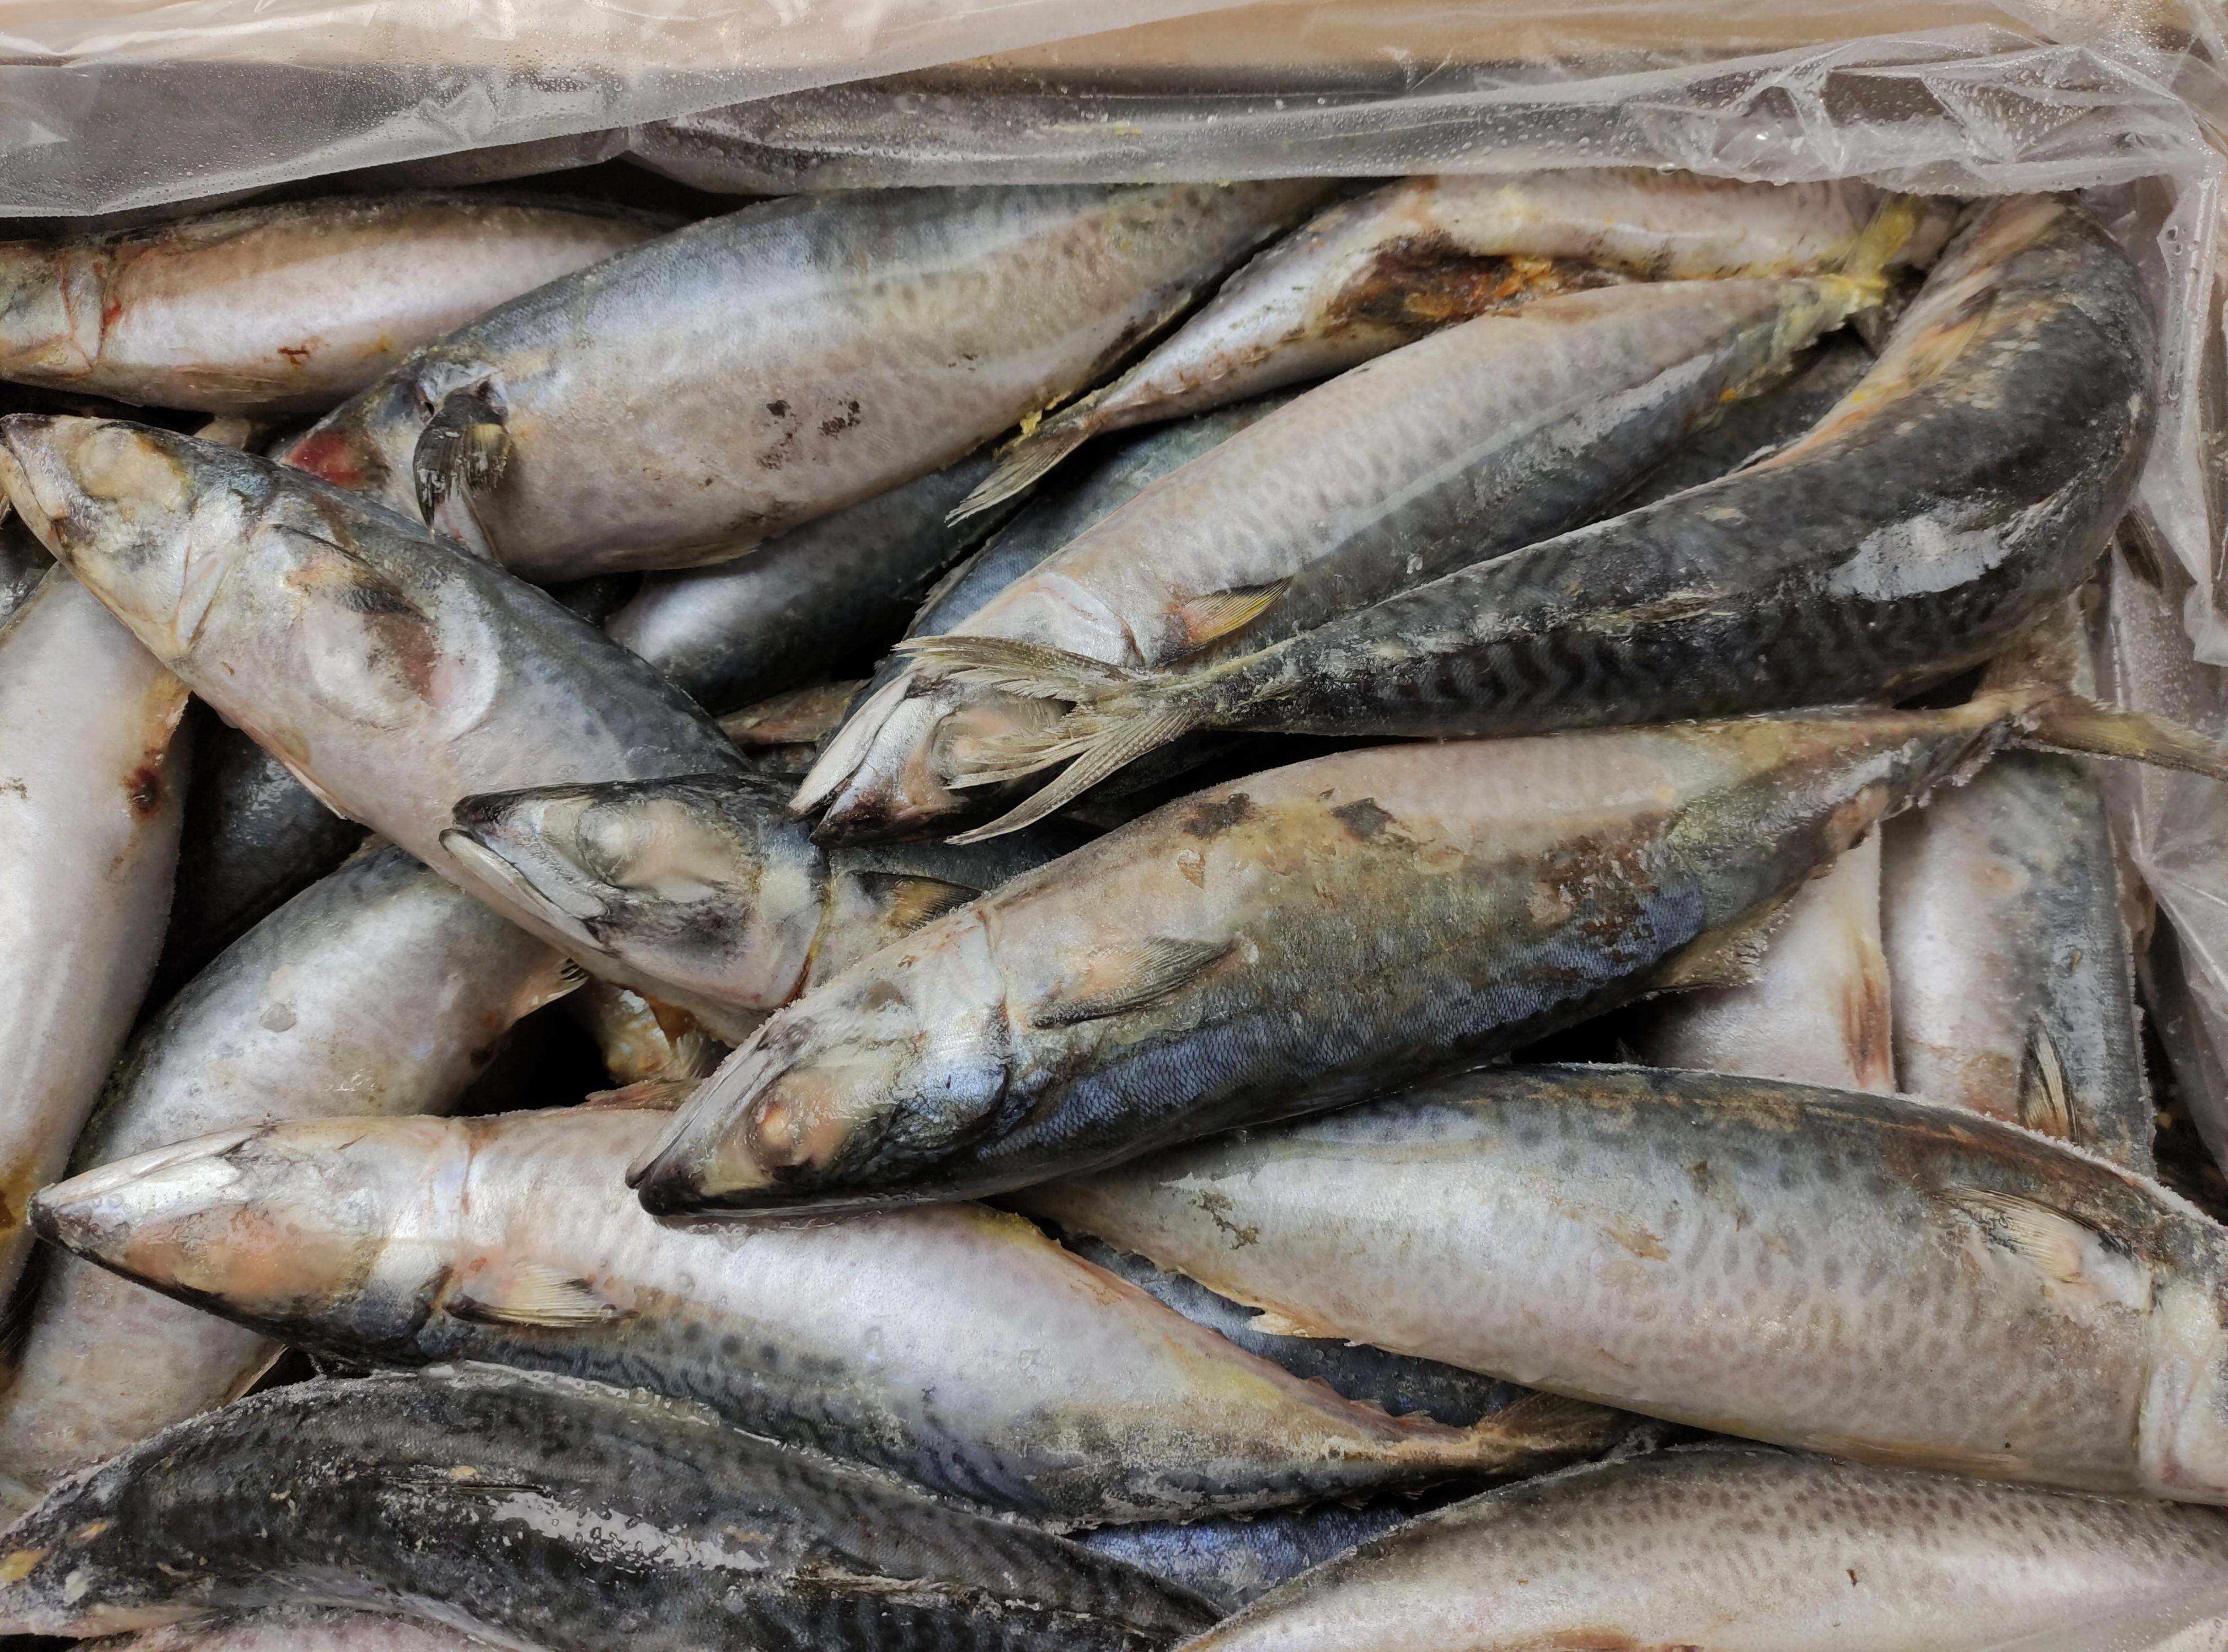 Mackerels Whole 100-400 20 kg- MA